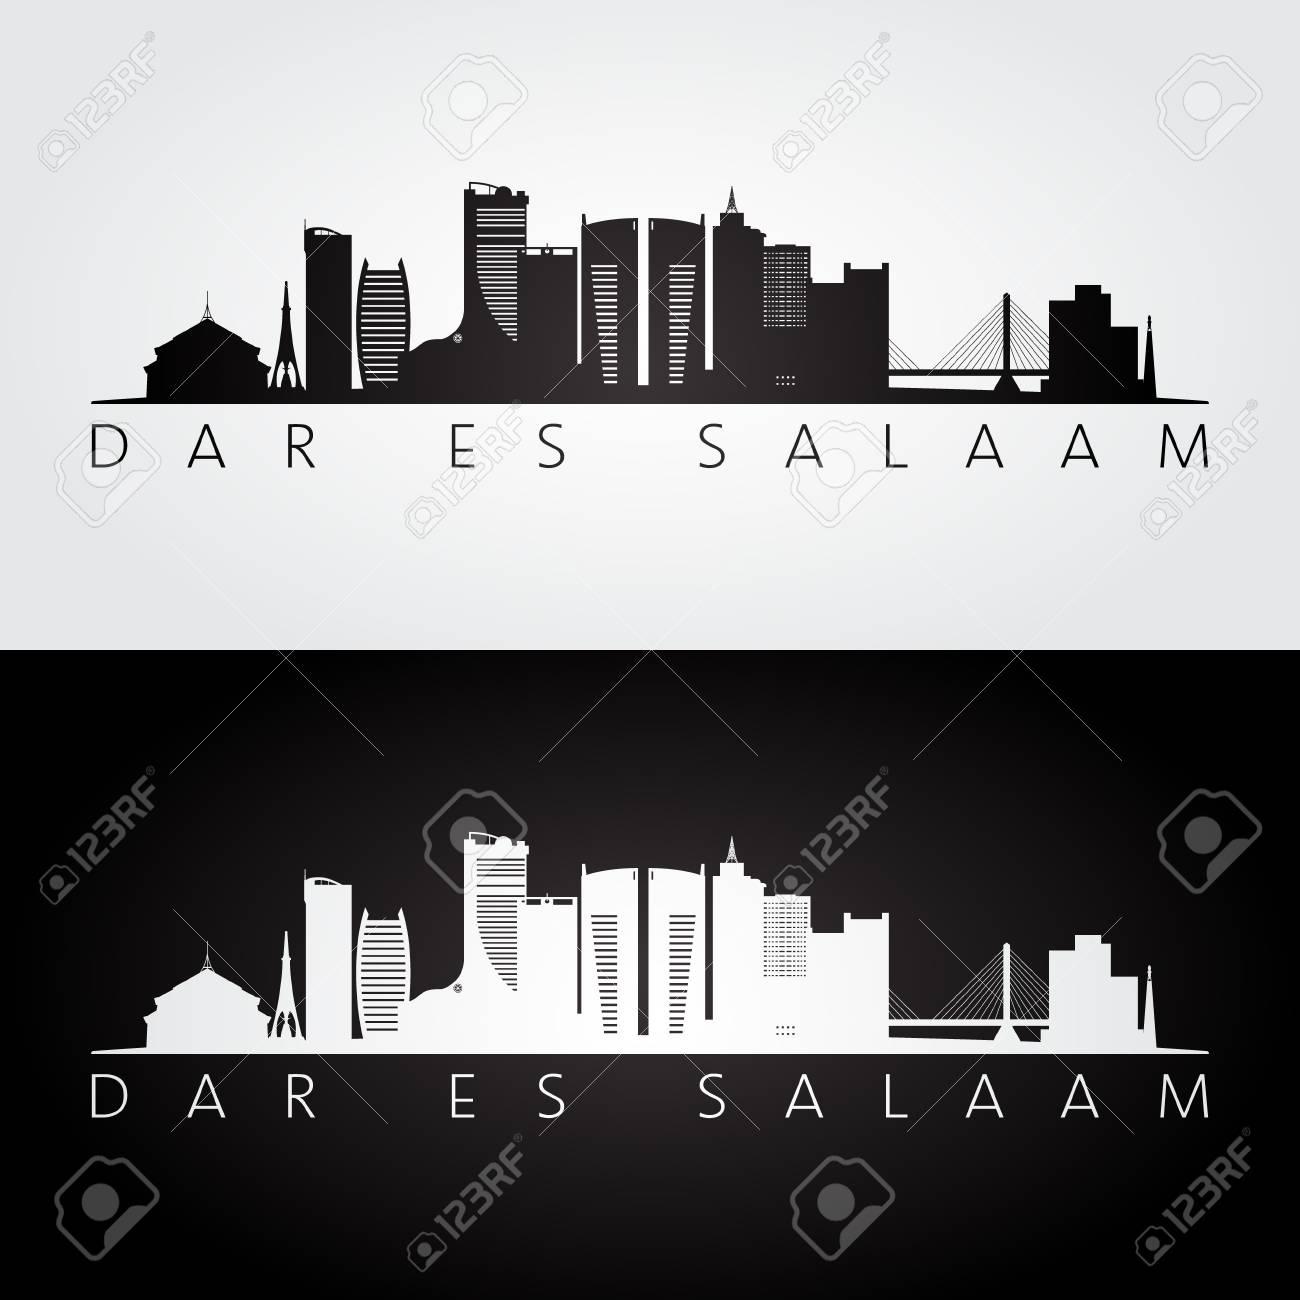 Dar es Salaam skyline and landmarks silhouette, black and white design, vector illustration. - 113408936